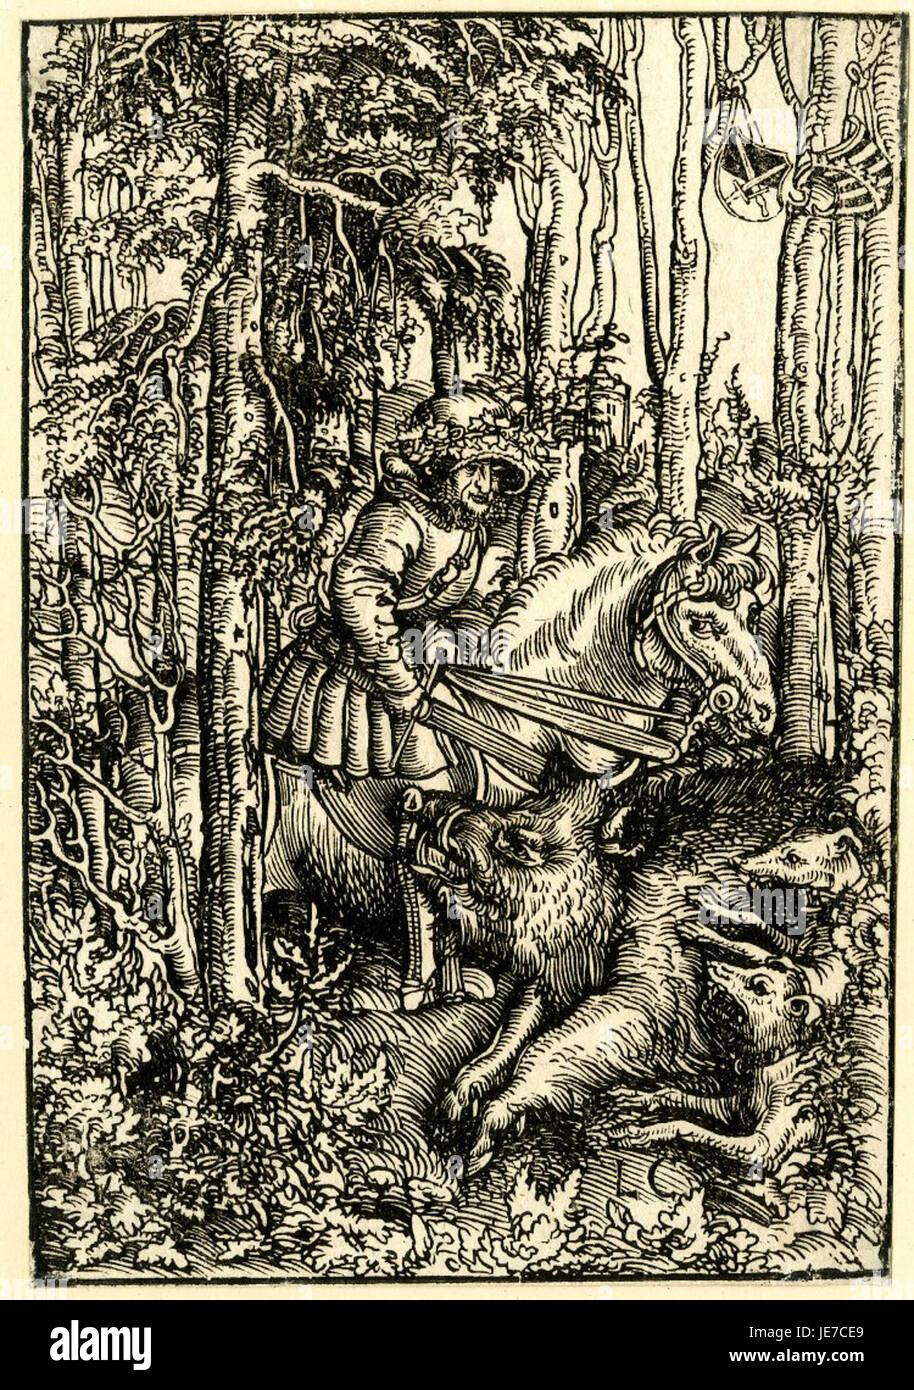 A boar hunt by Lucas Cranach the Elder - Stock Image